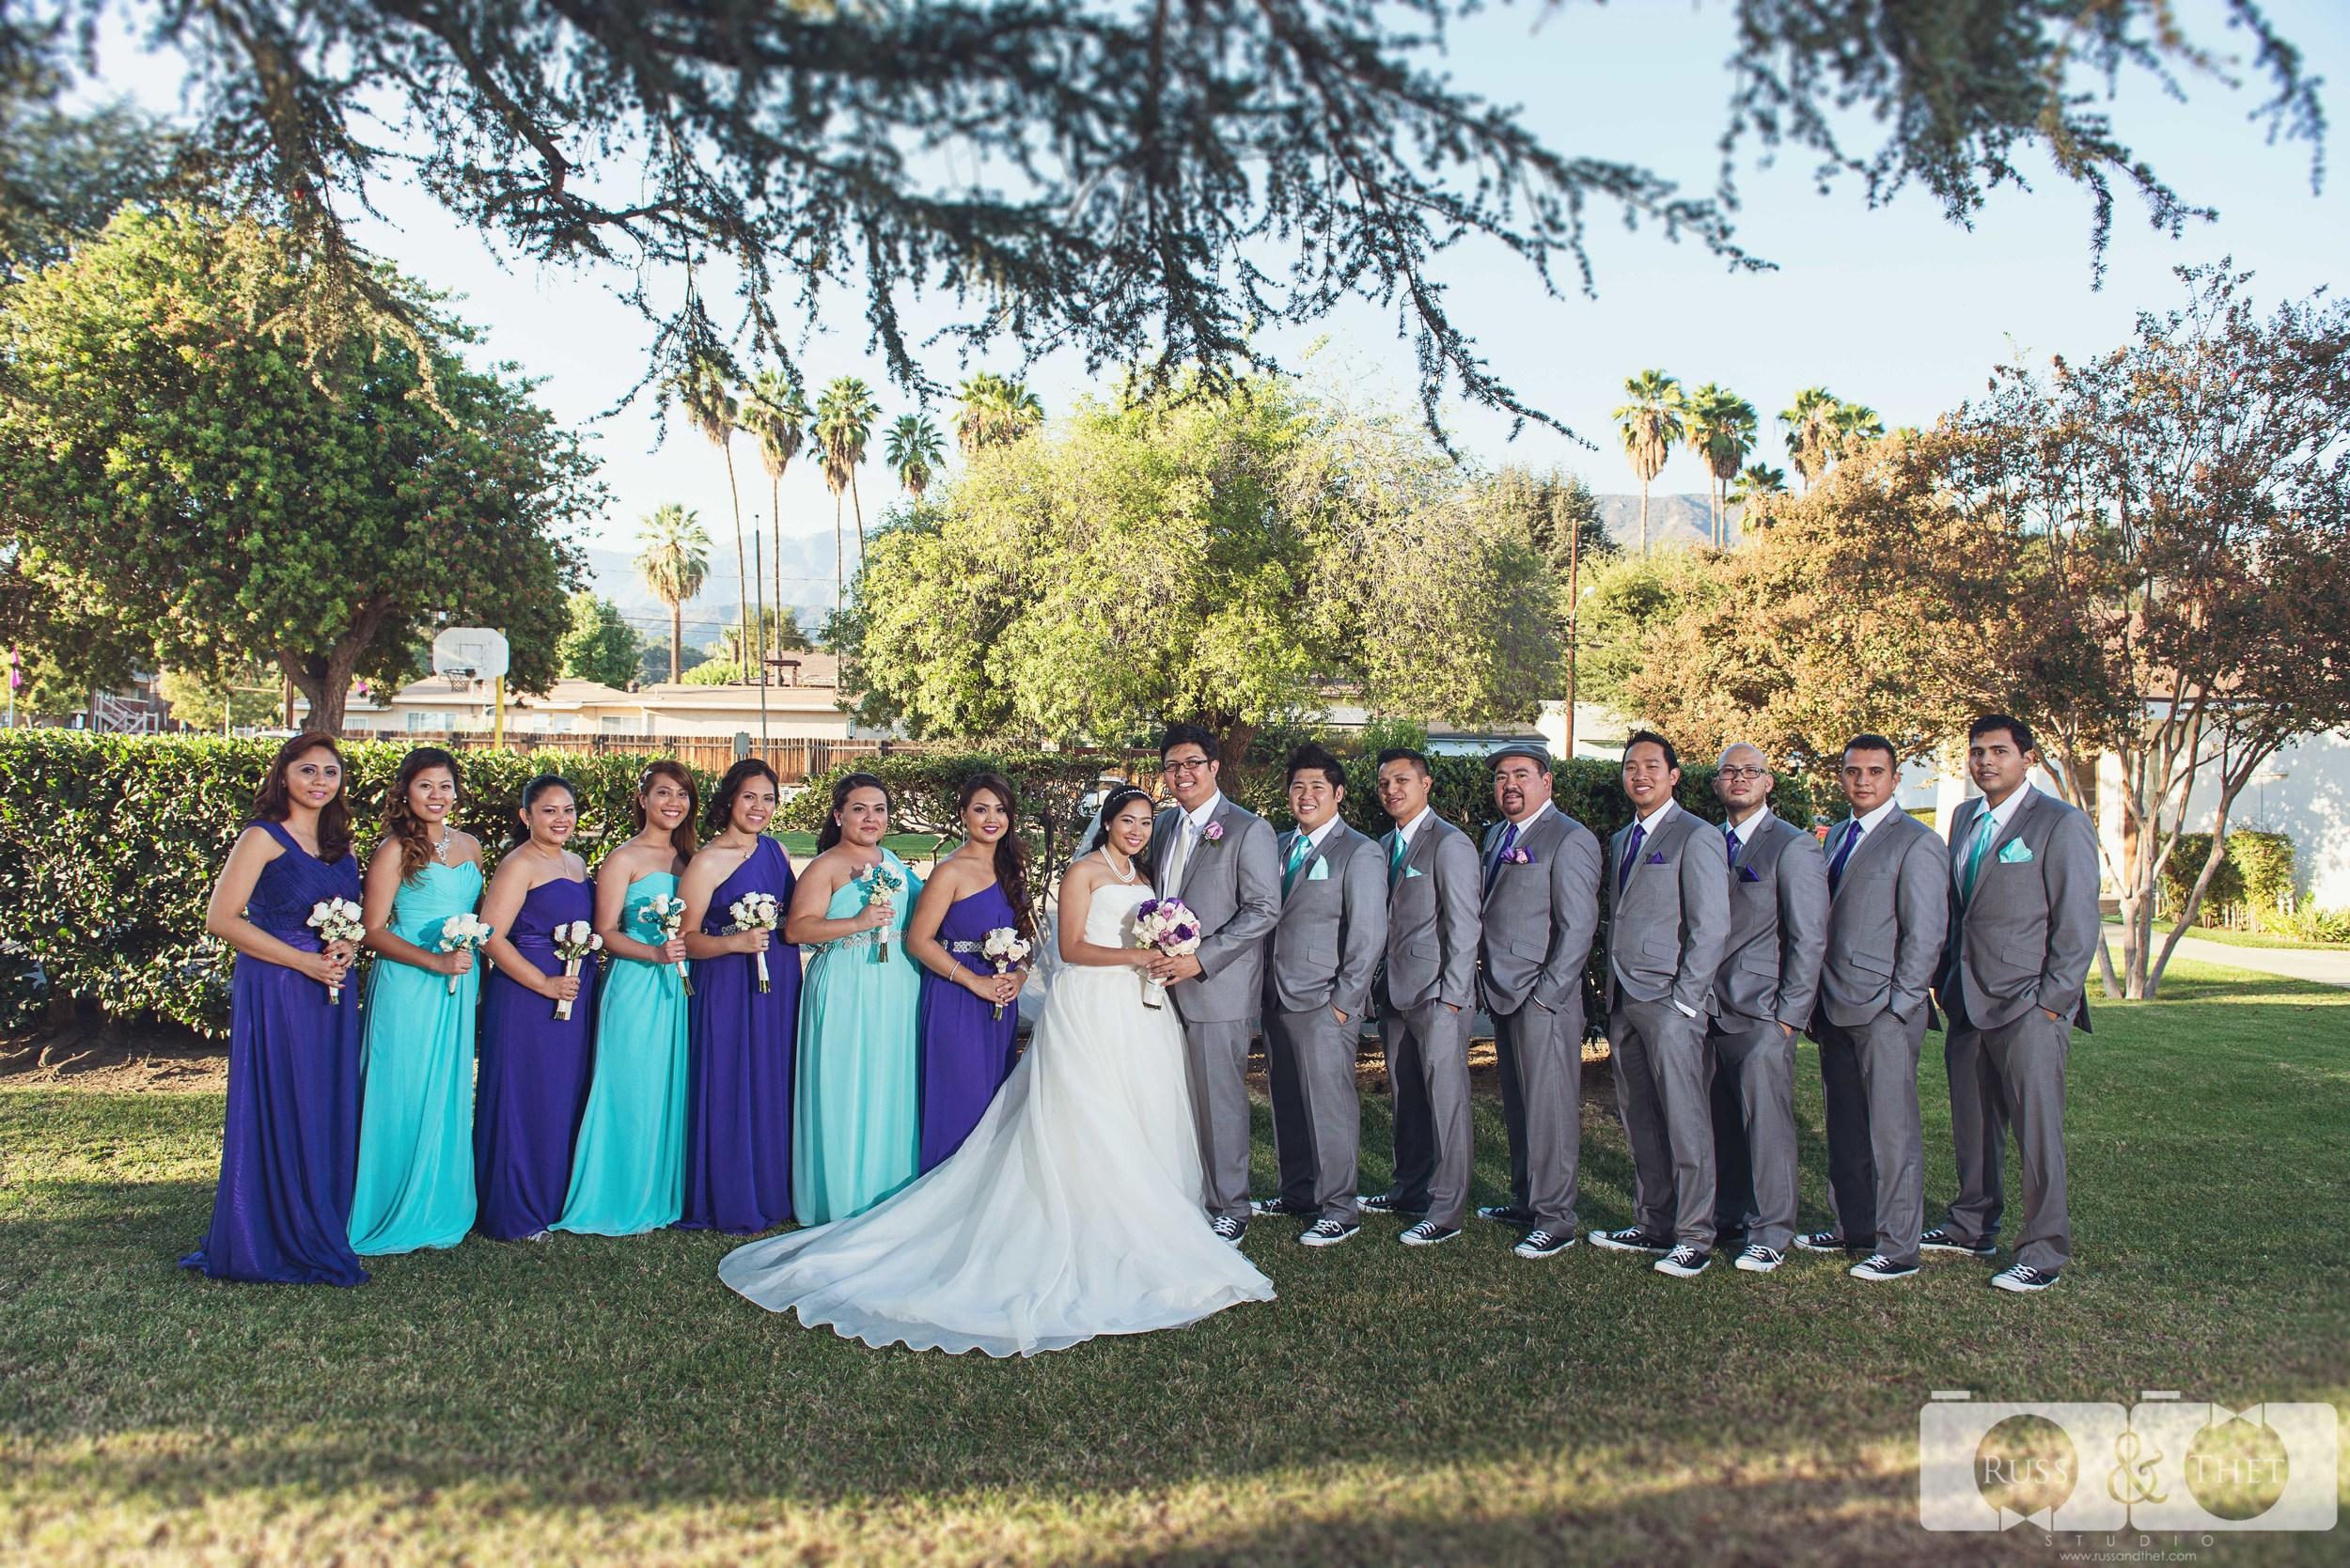 royal-palace-banquet-hall-glendale-wedding-44.JPG